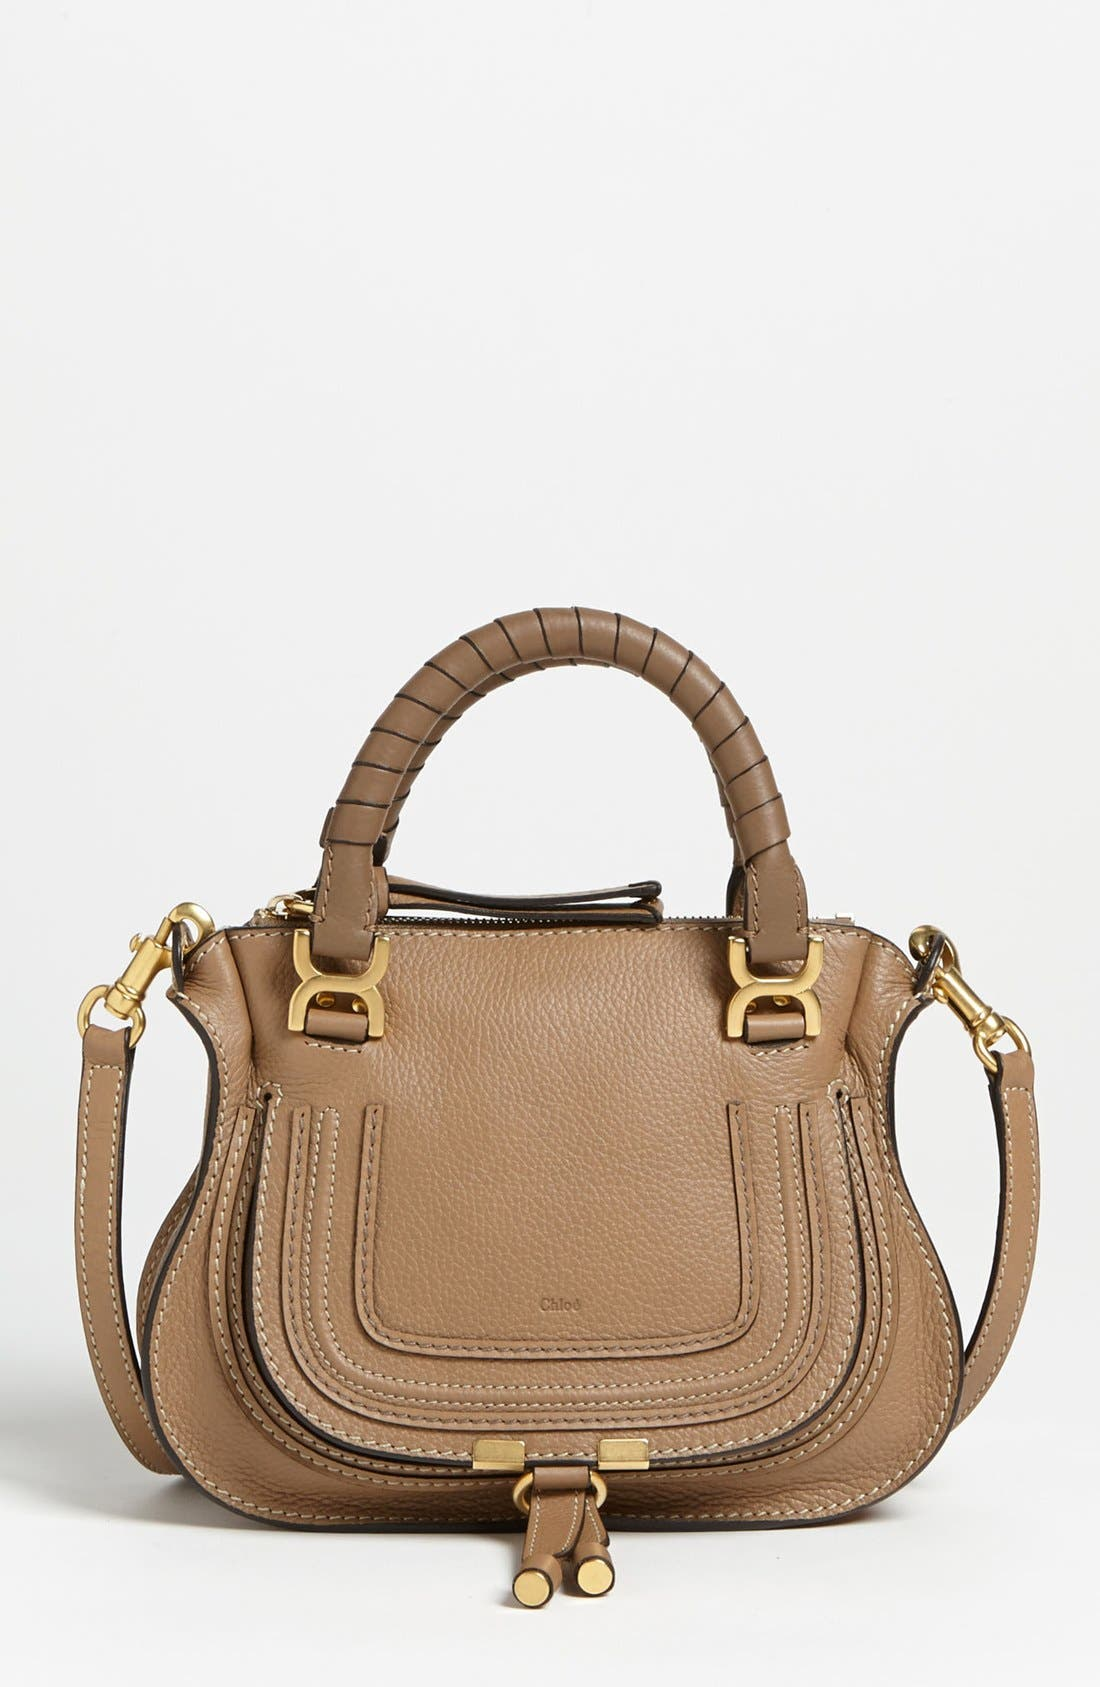 chloe marcie mini. main image - chloé \u0027marcie mini\u0027 satchel. \u0027 chloe marcie mini s